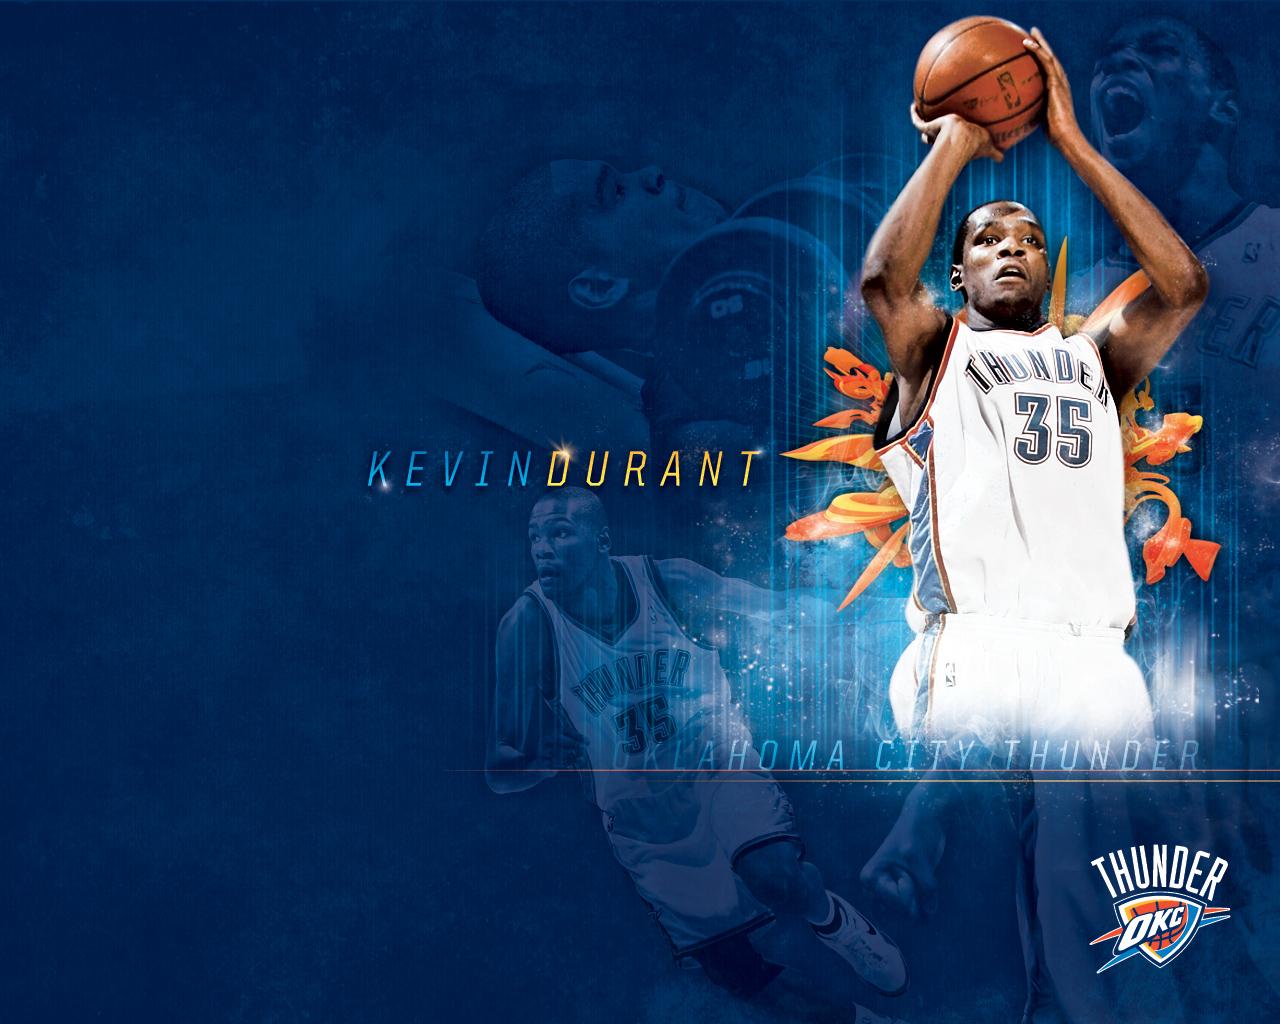 Kevin Durant Wallpaper Desktop Backgrounds for HD 1280x1024